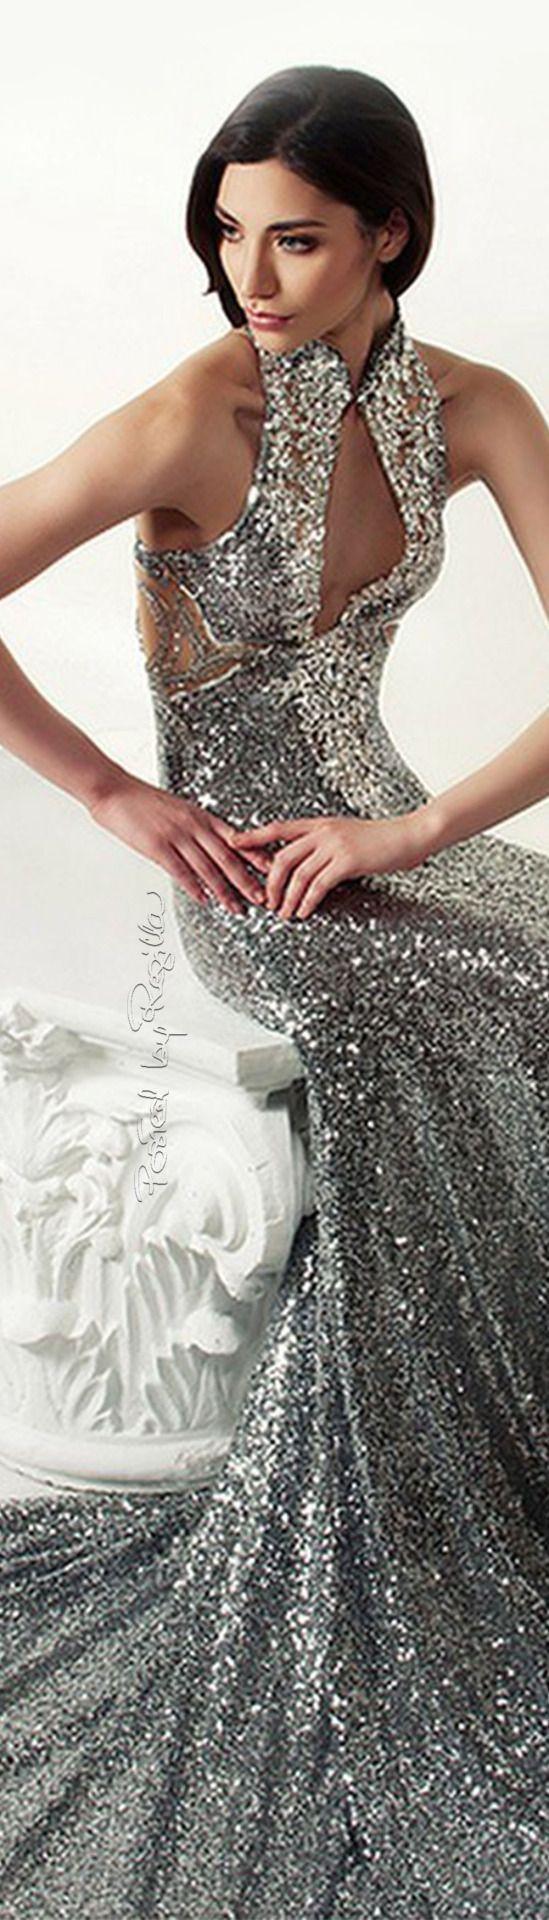 Regilla ⚜ Leo Almodal | Blingbling style | Pinterest | Silber und ...